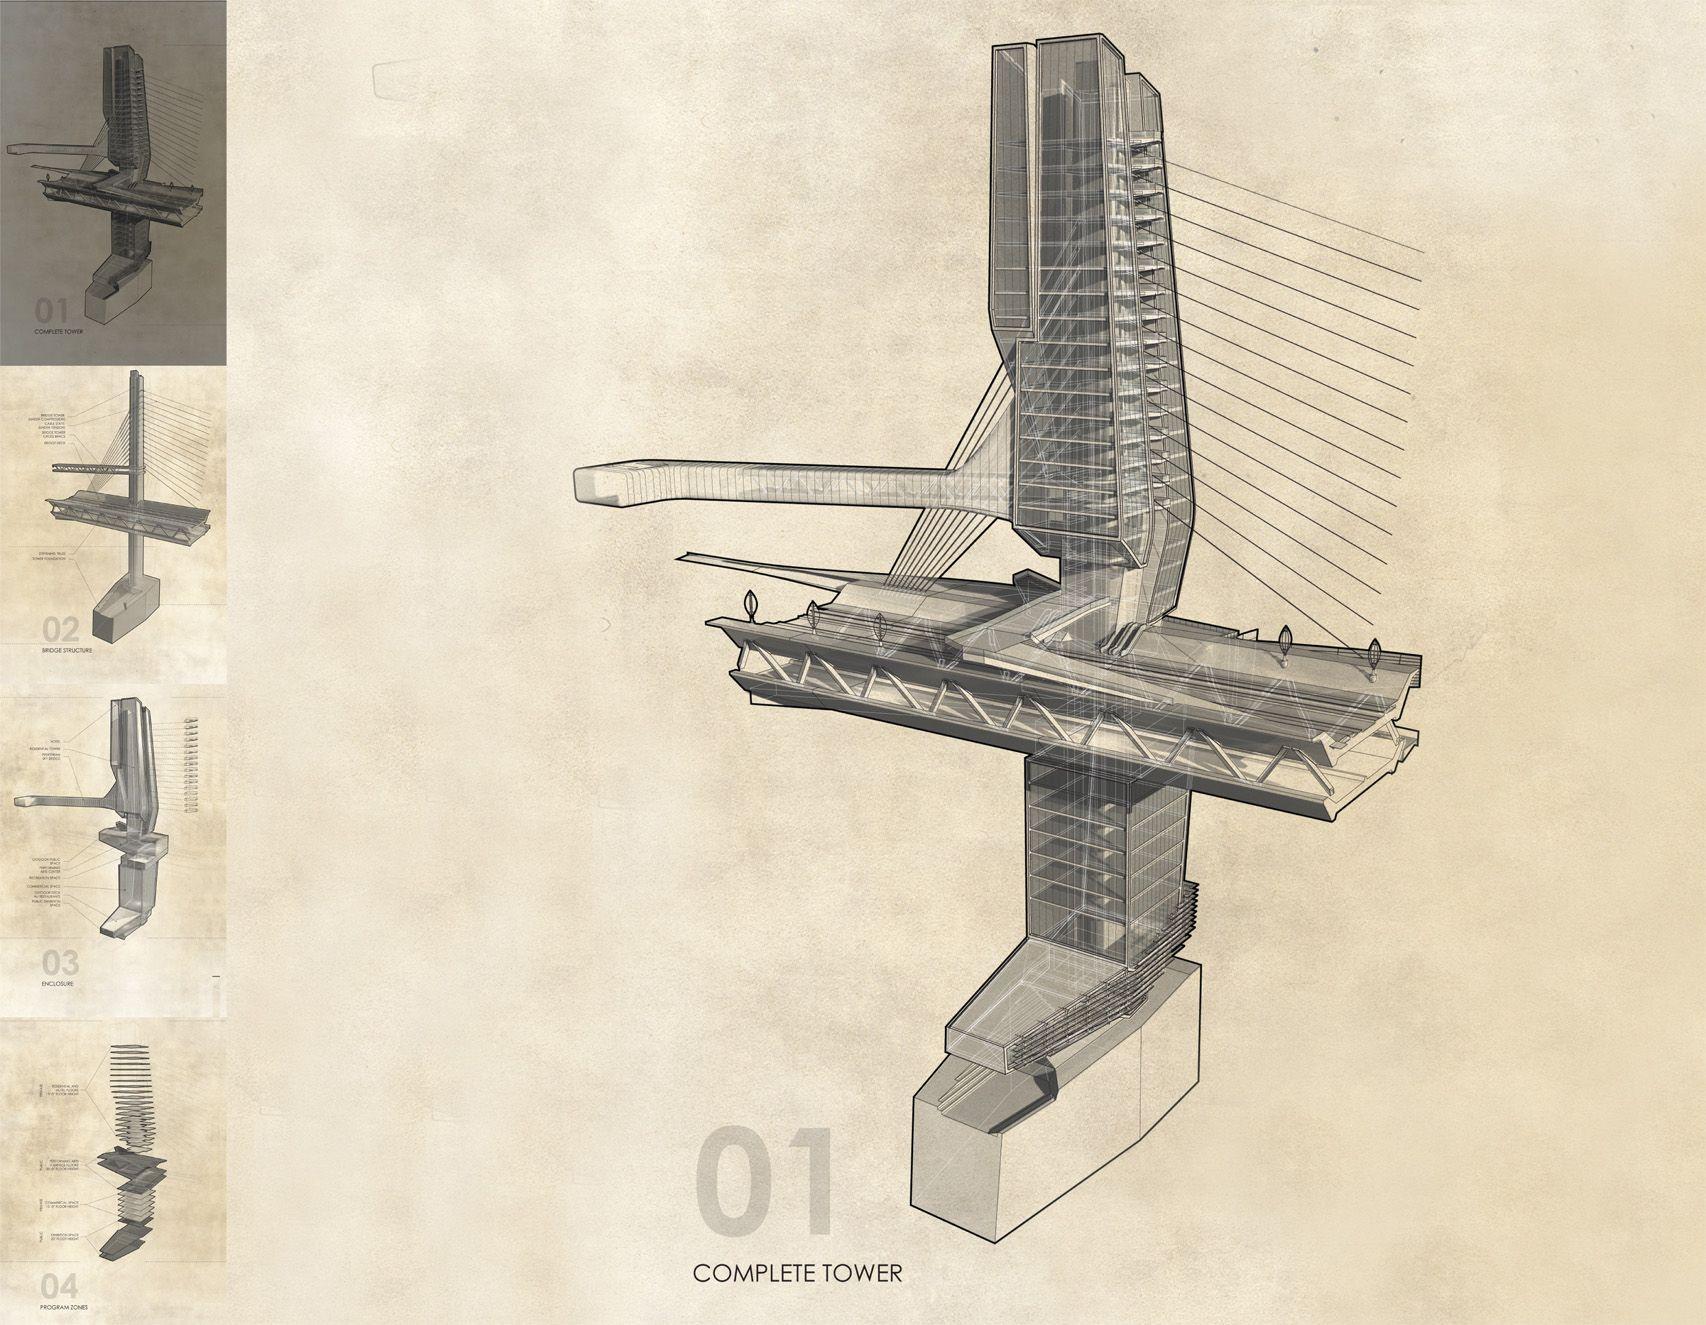 Architectural Drawings Of Bridges bay bridge 2050 - aaron berman architecture | drawing | pinterest